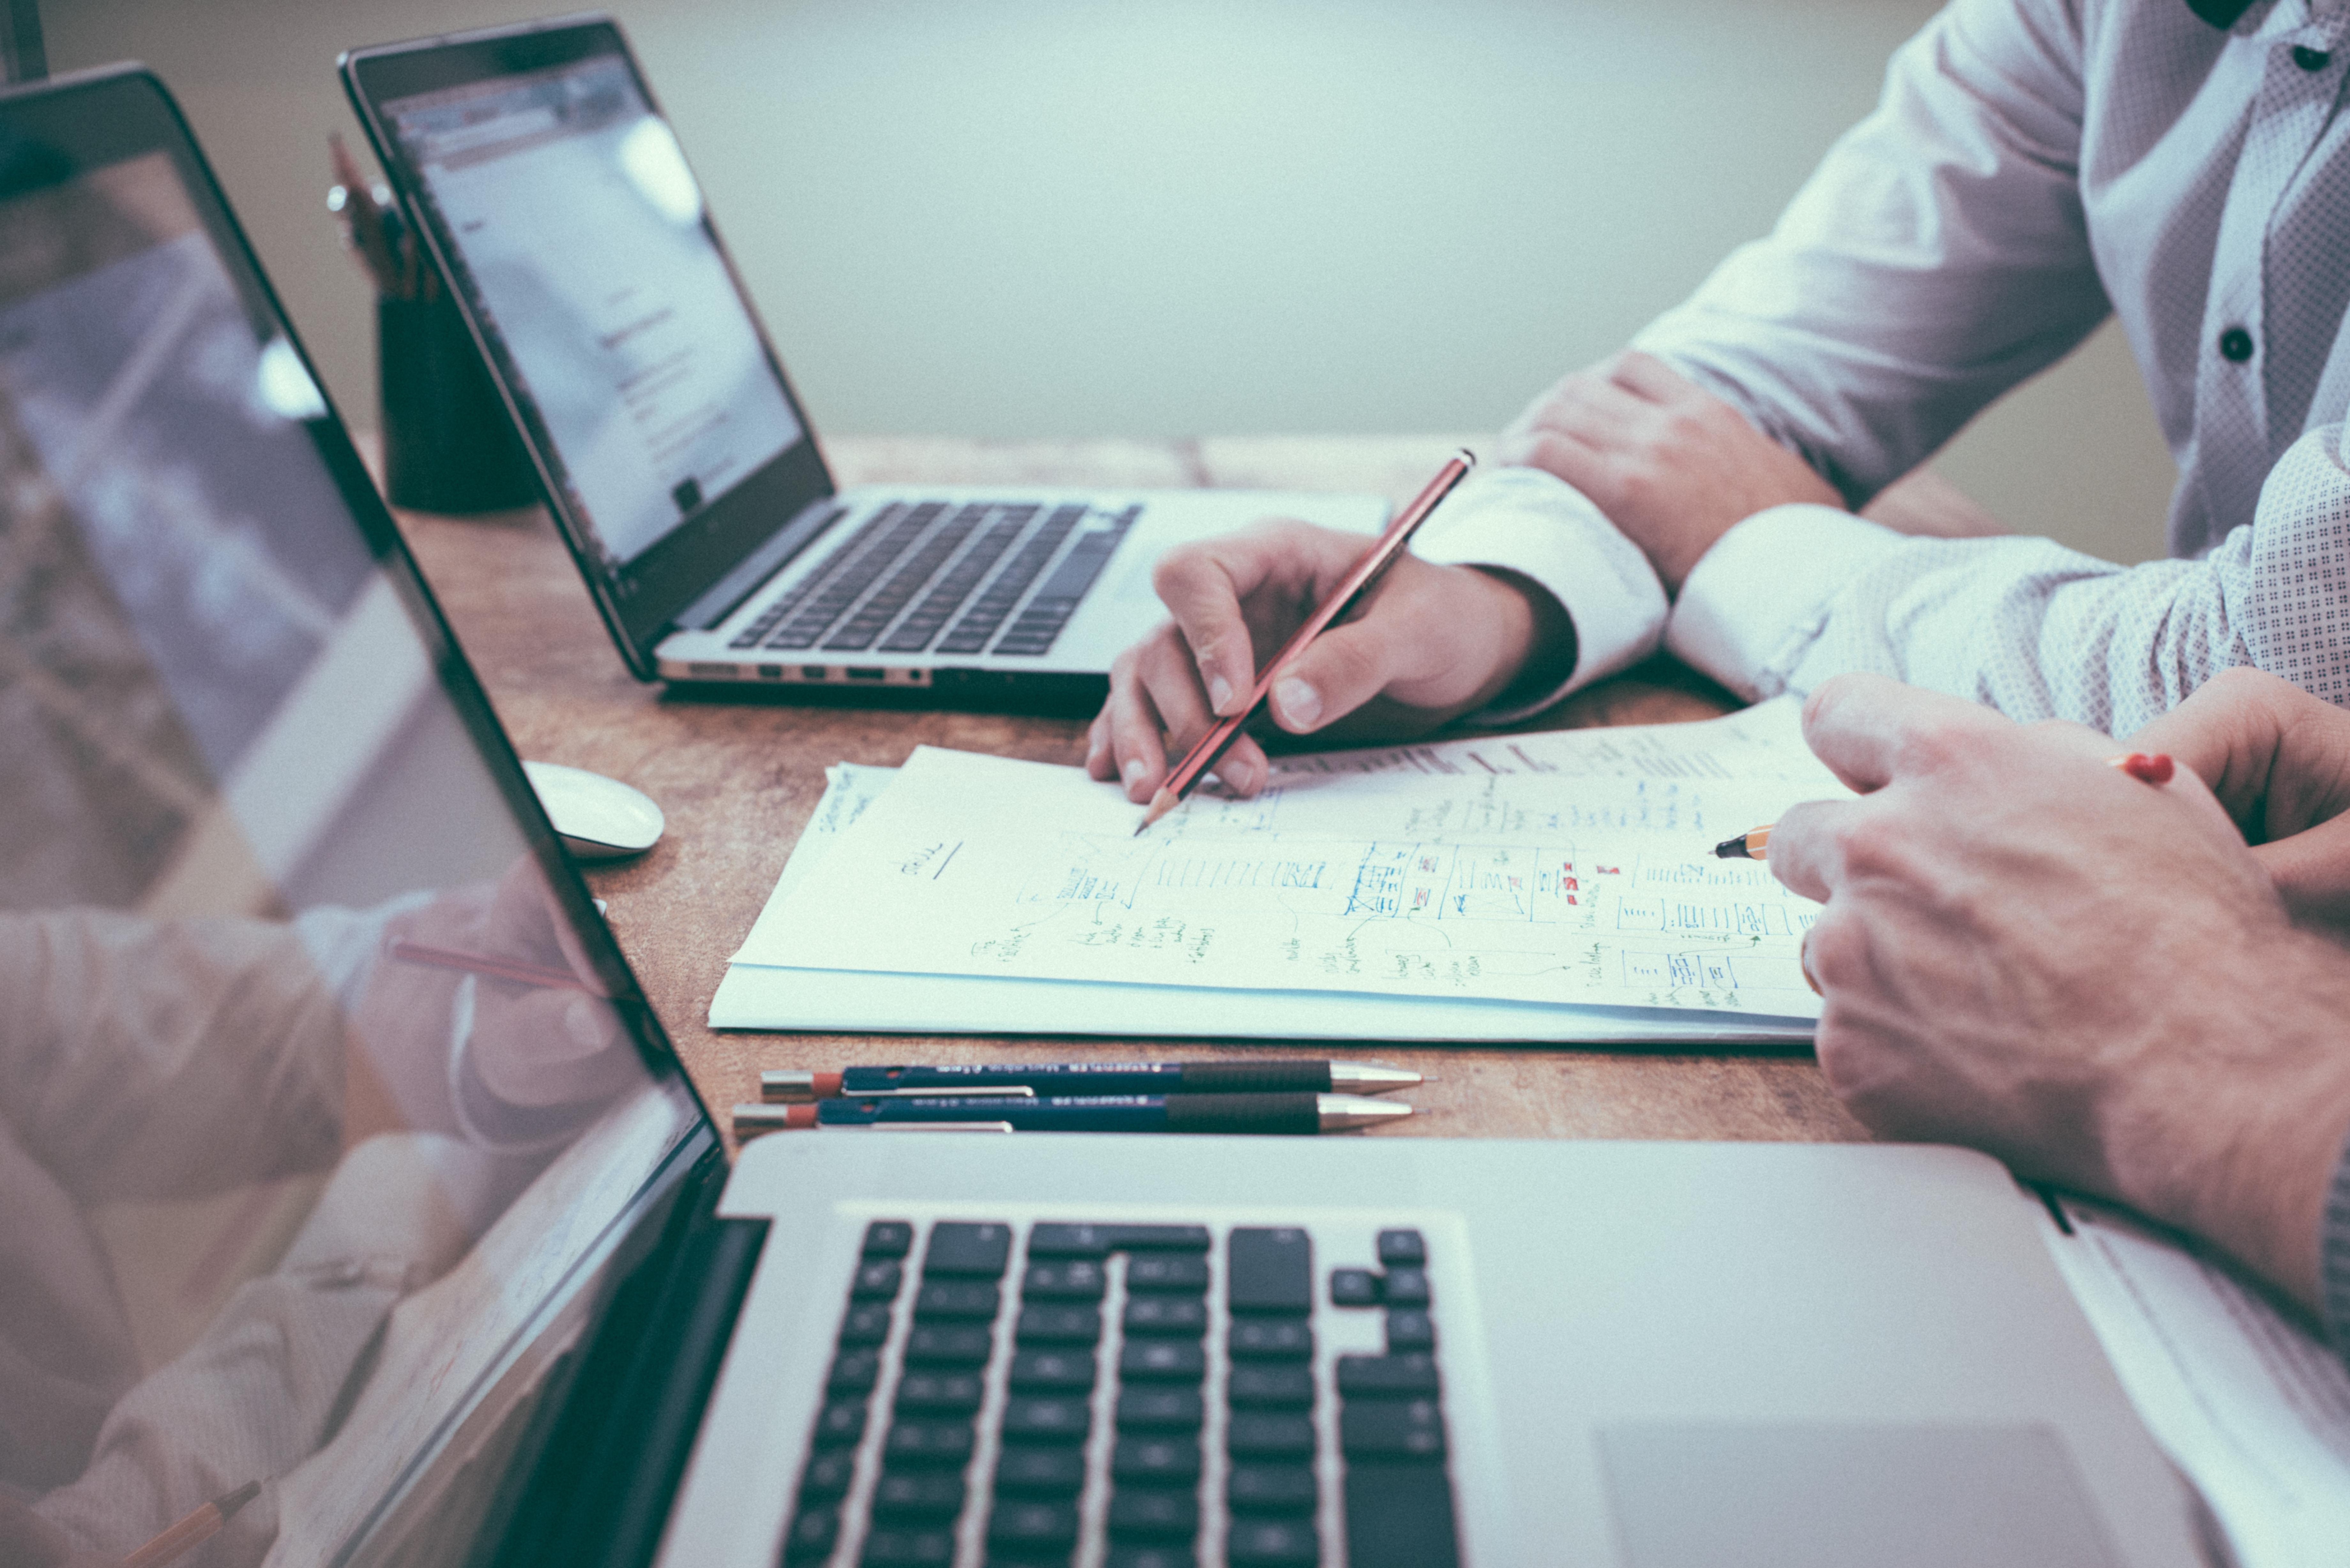 choosing a business structure: sole trader vs limited company vs umbrella company